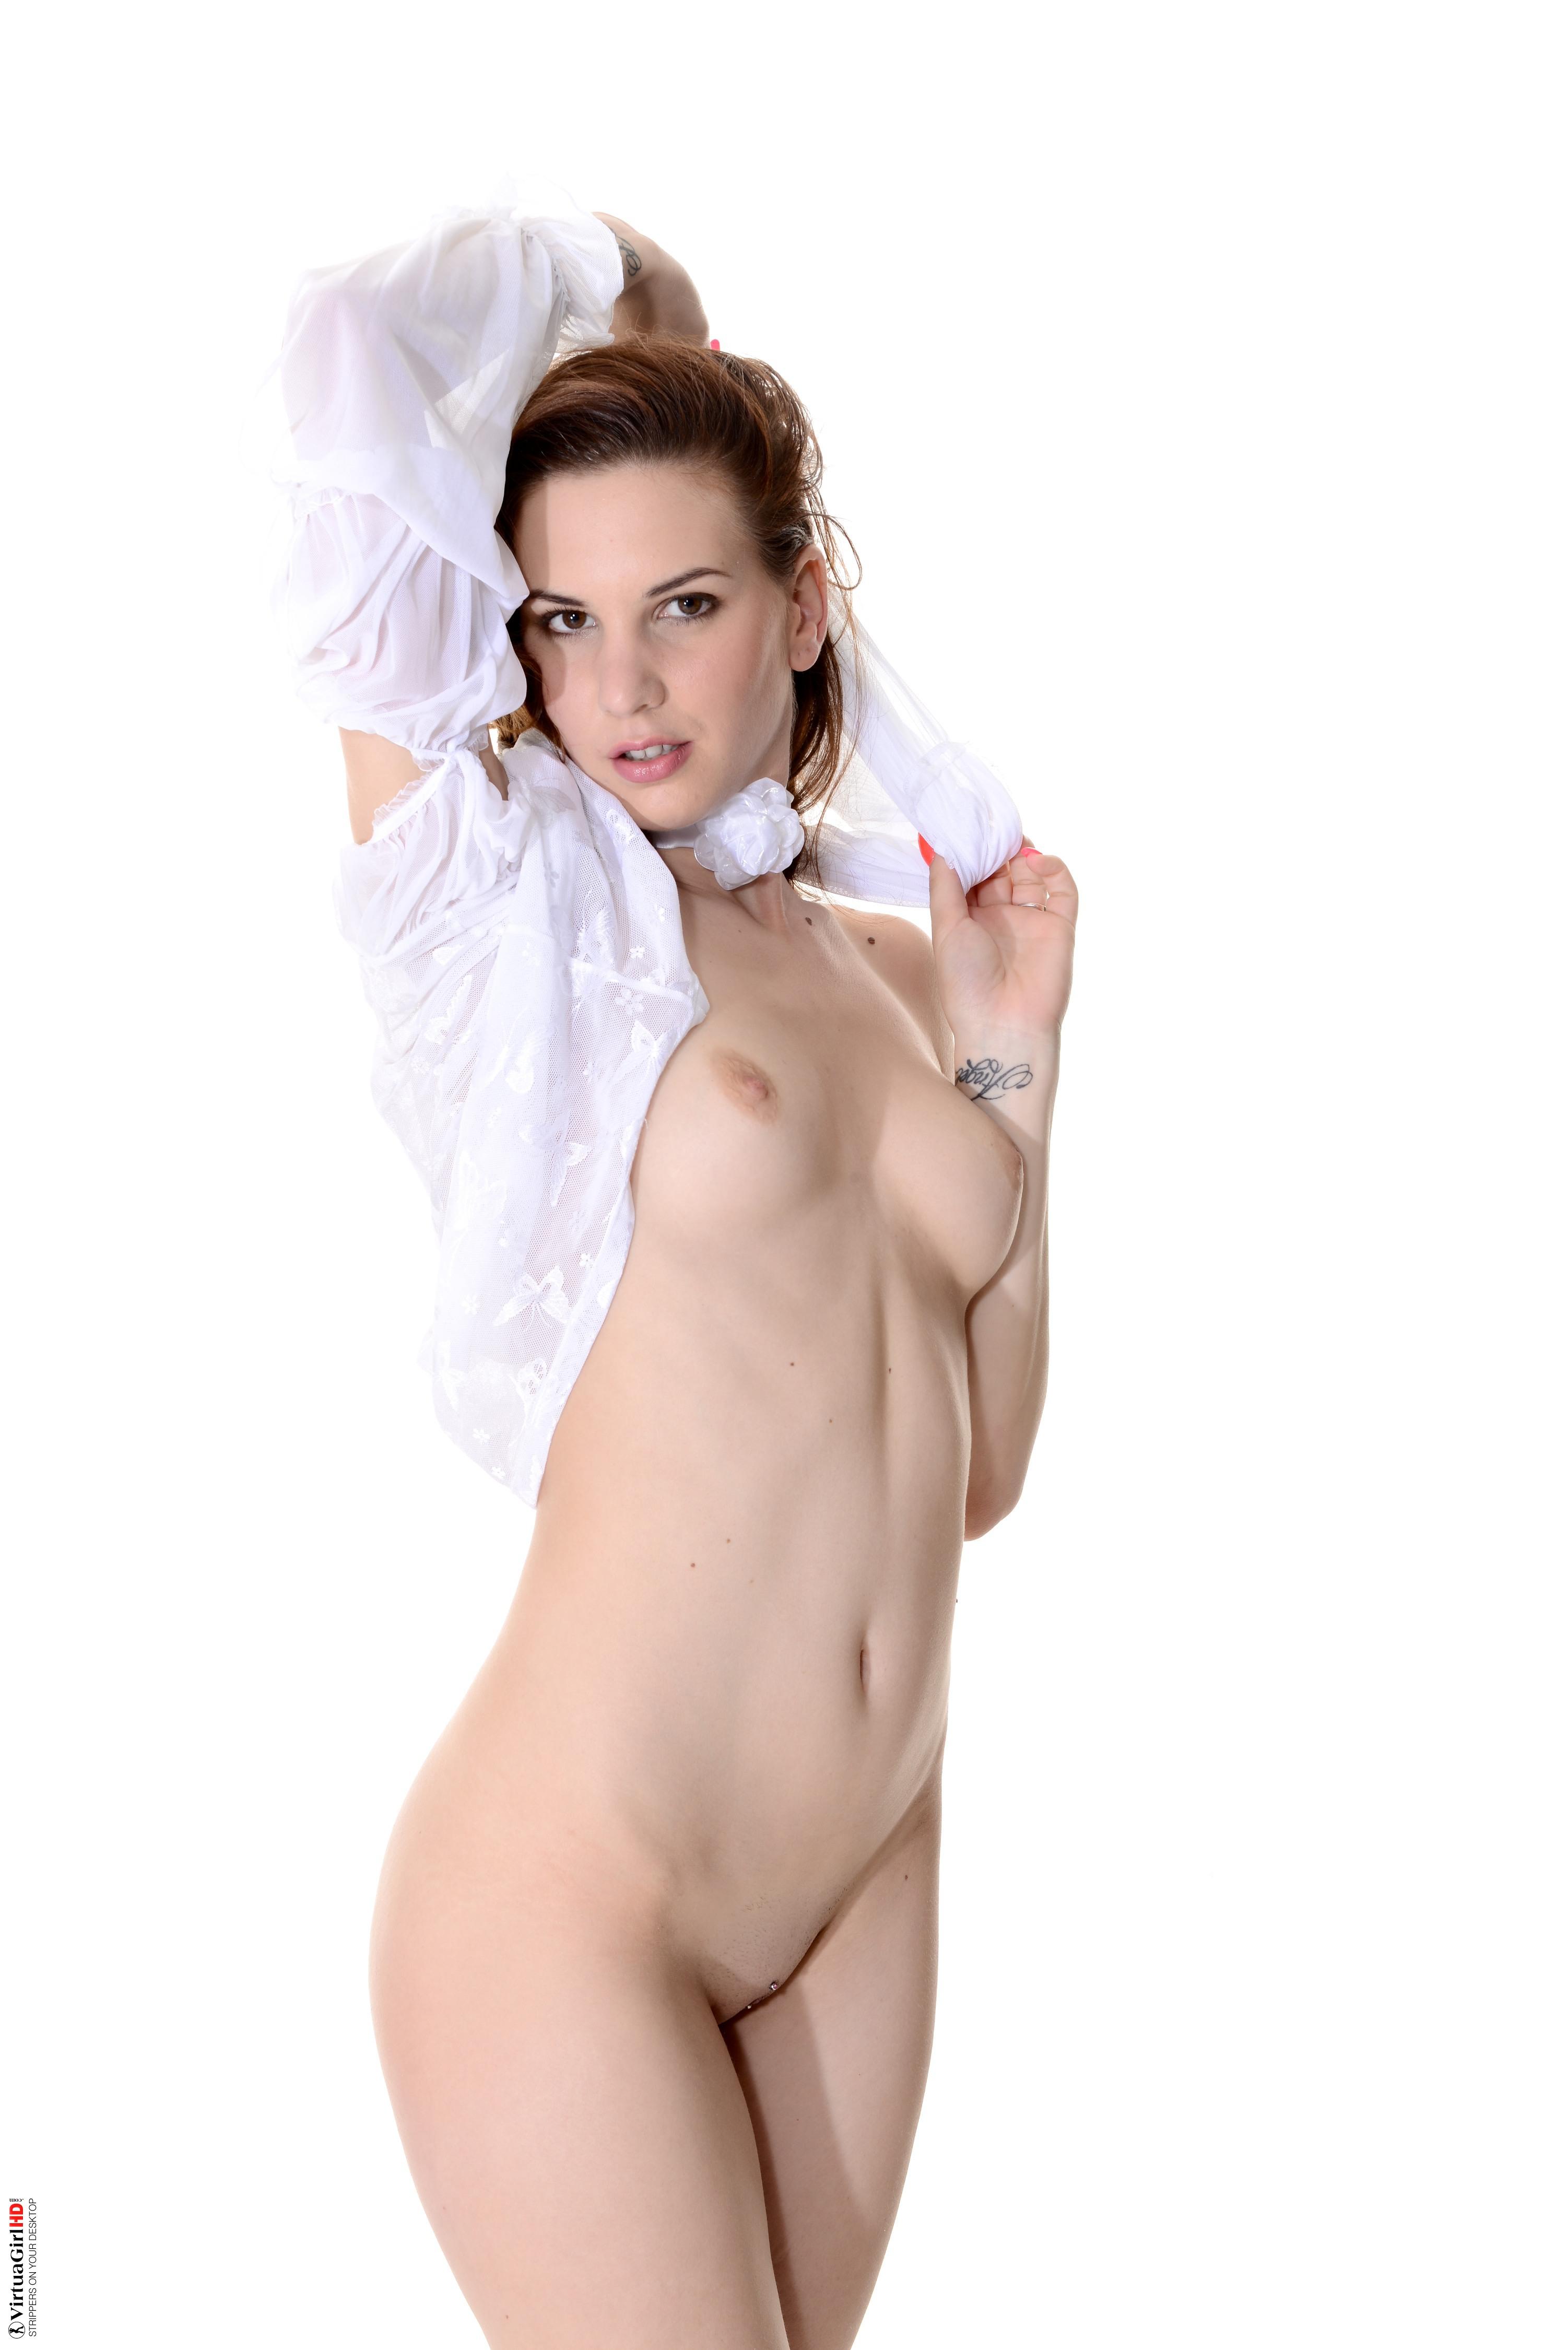 hot nude girls wallpaper